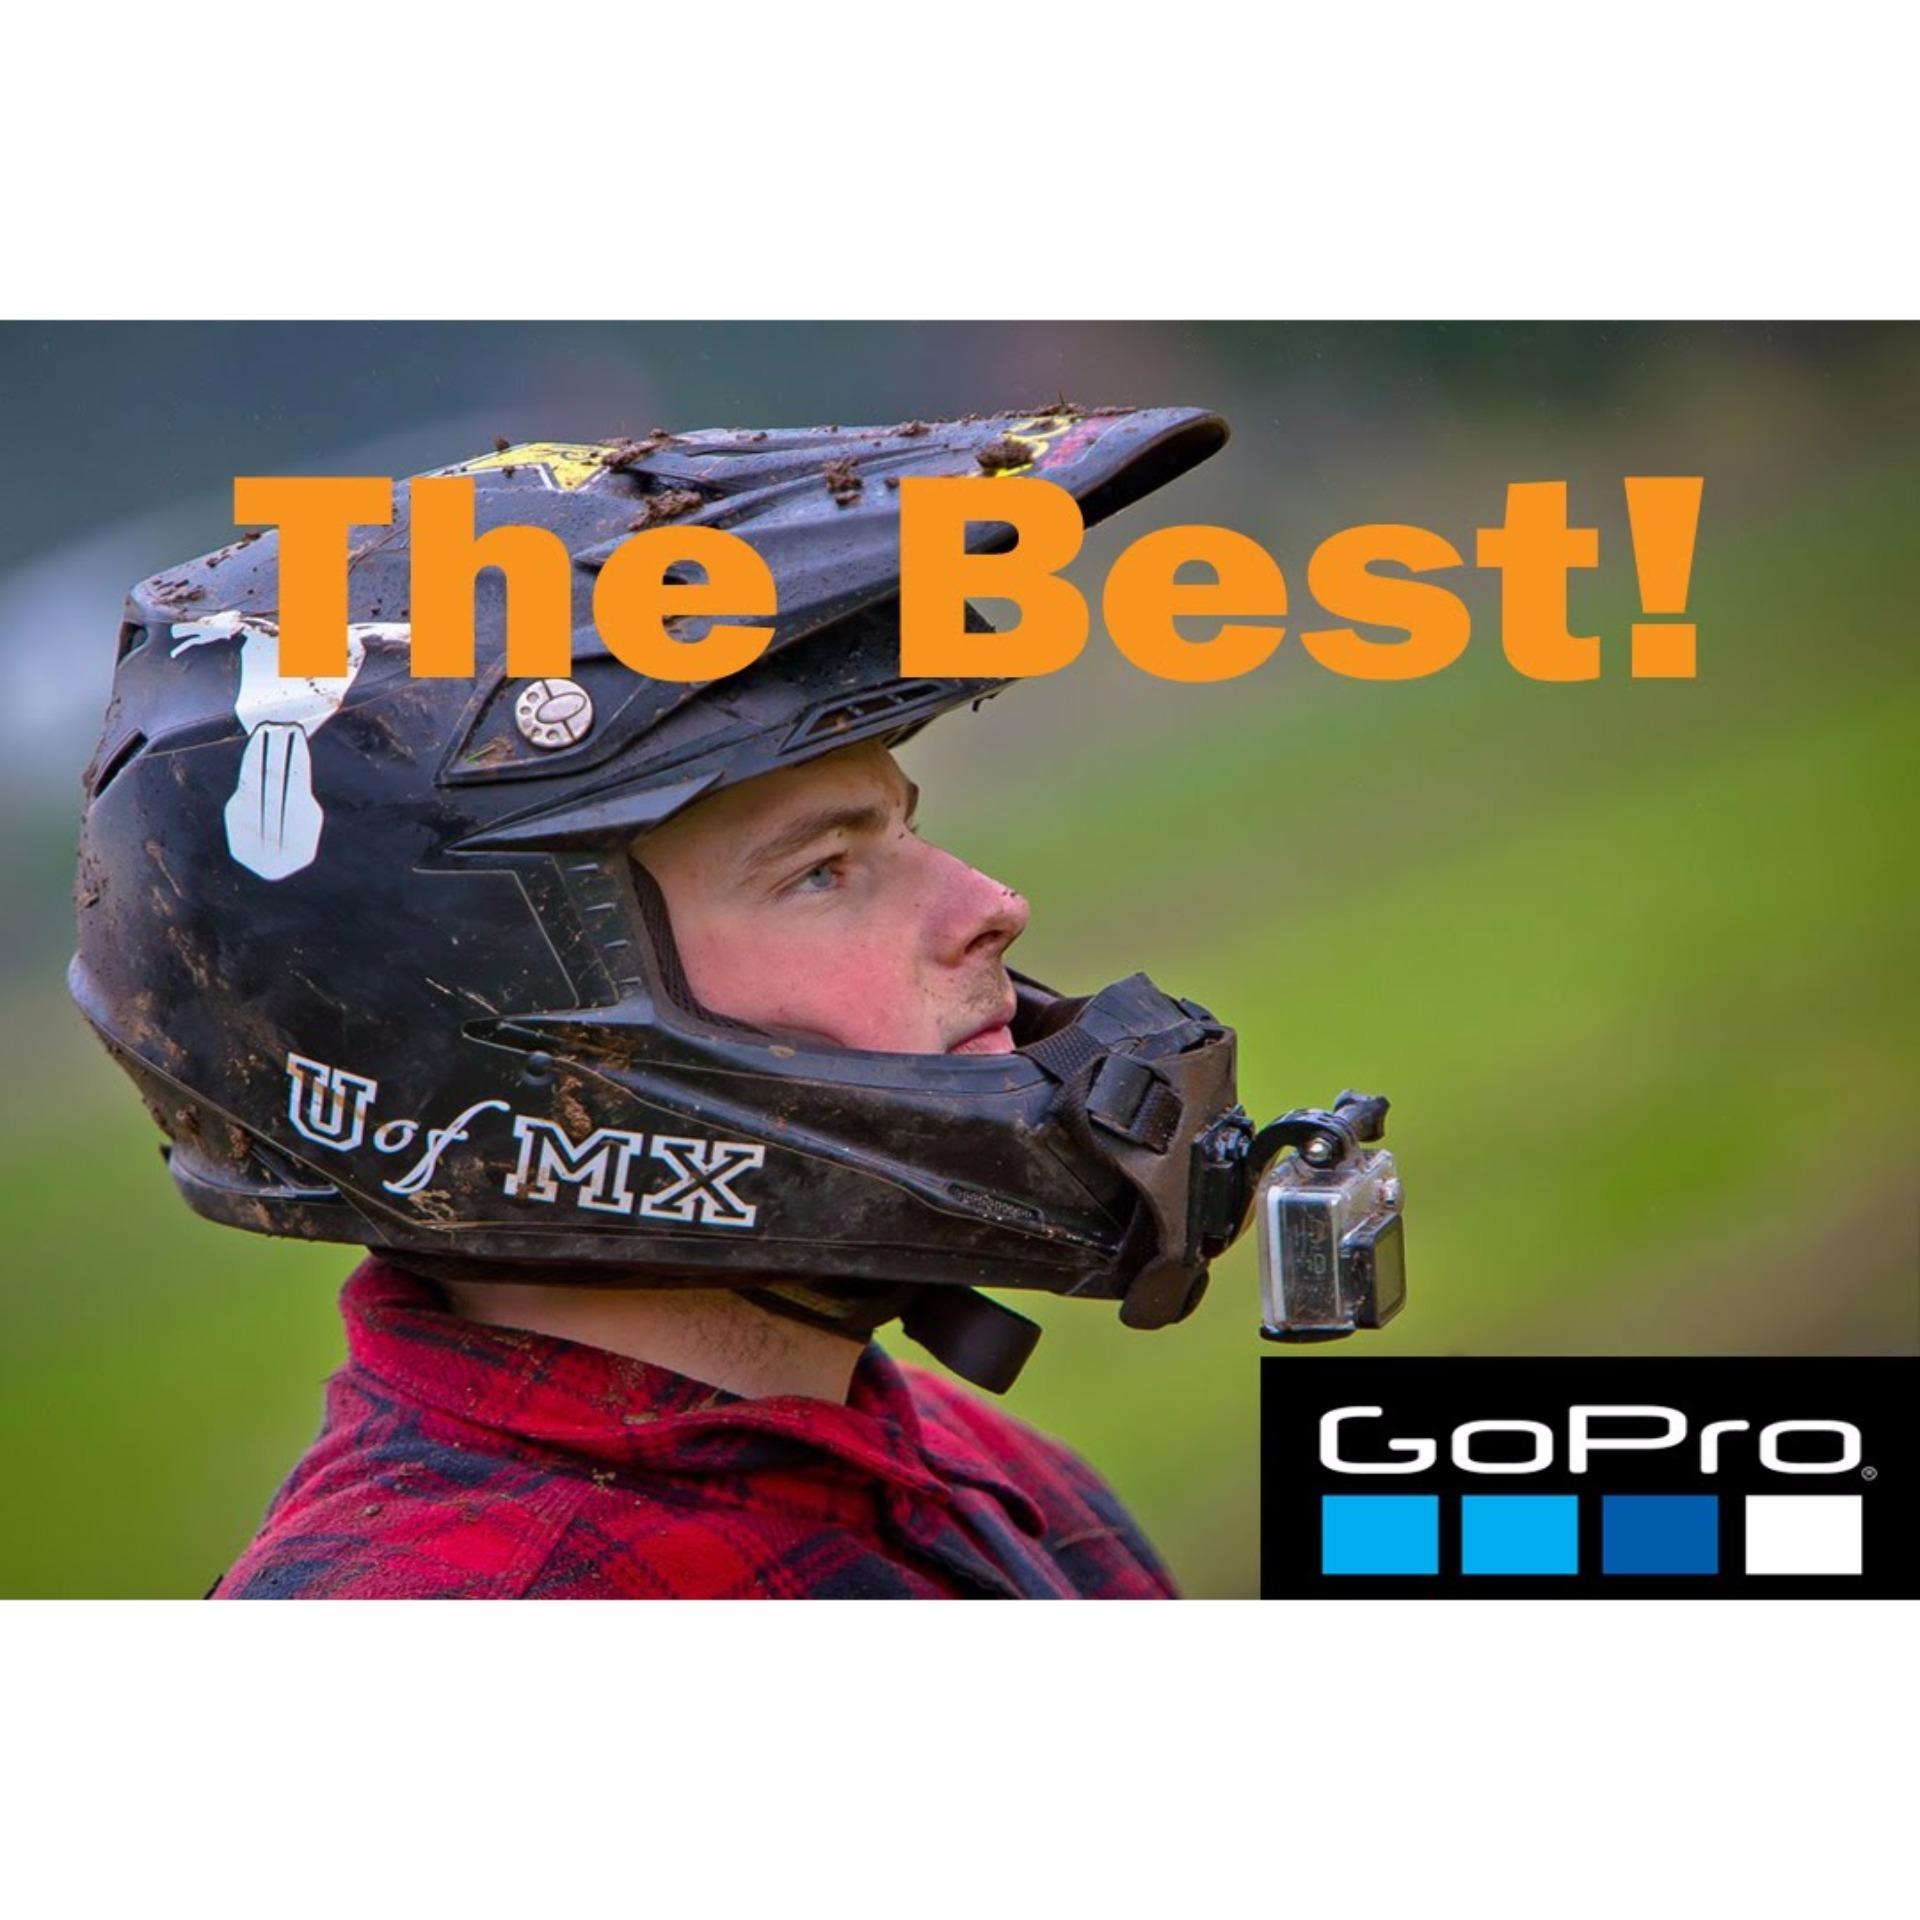 Perbandingan Harga Helm Mount Motovlog Aksesoris Xiaomi Yi Gopro Complete Set For Bike Helmet Brica B Pro Ampamp Camera 2 4k Herobrica Bpro Sjcam Kogan Eken